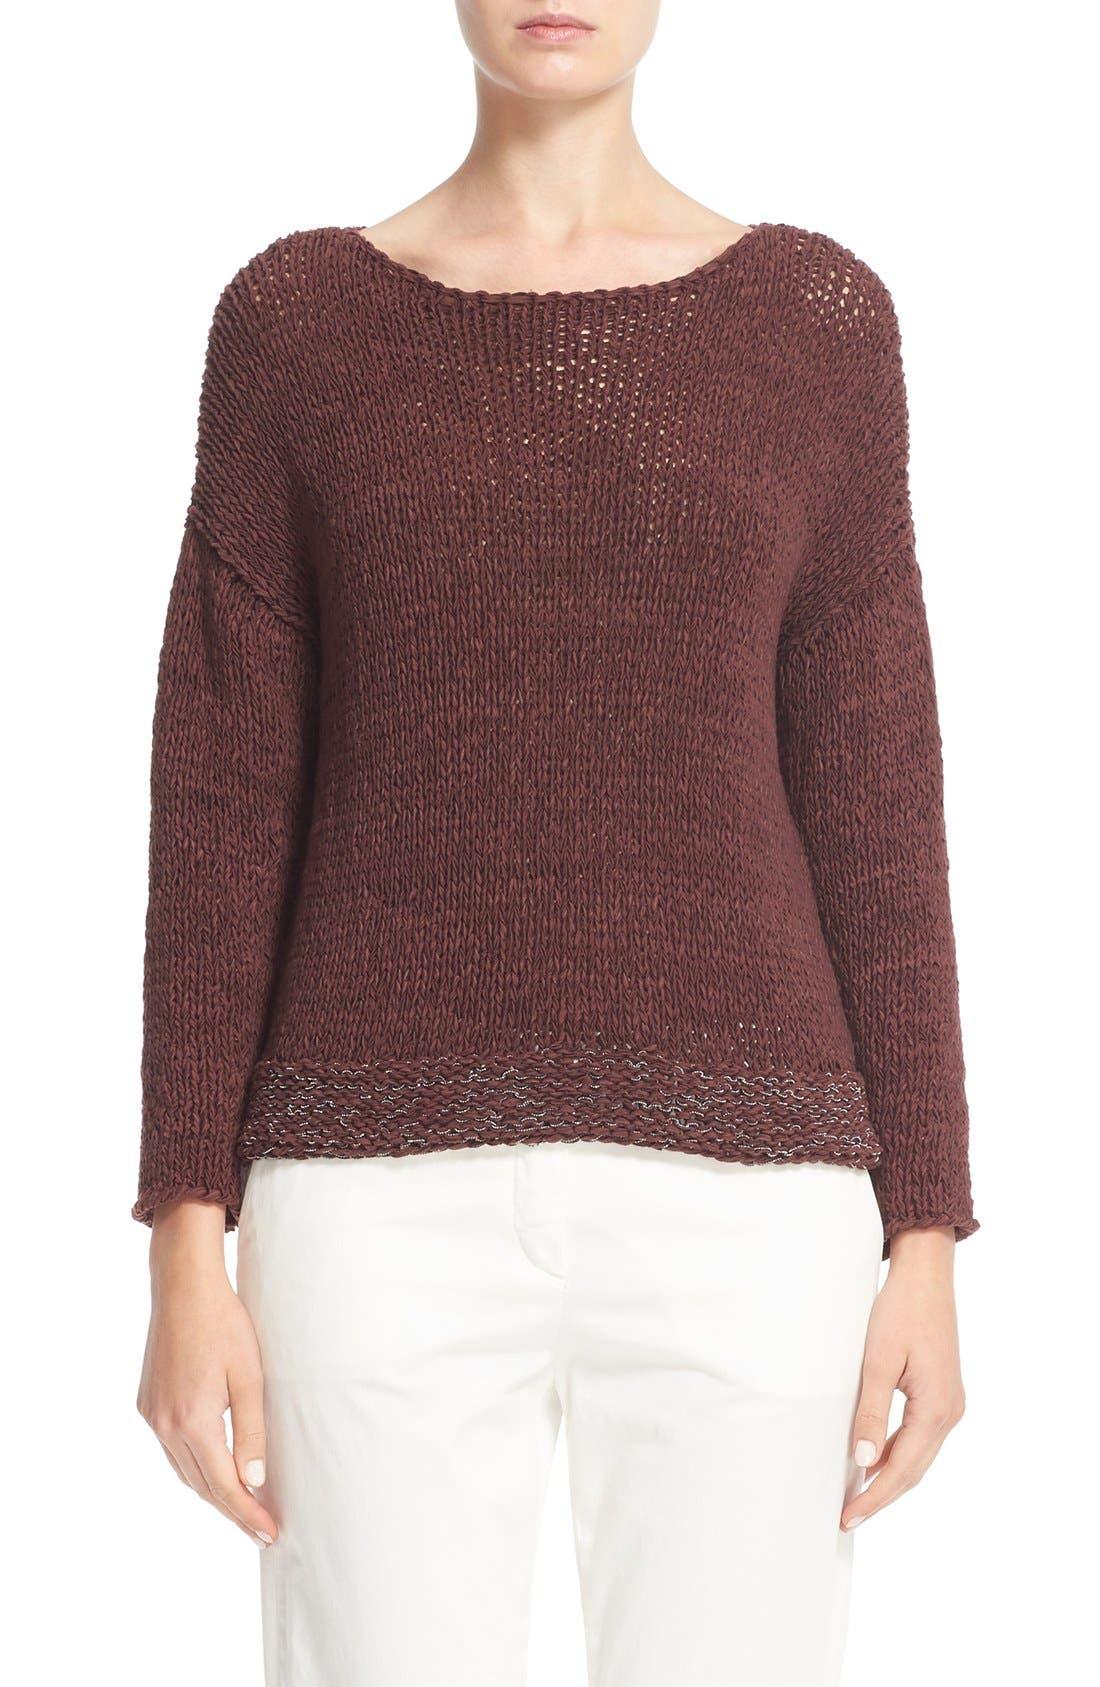 Mollini Trim Cotton Blend Sweater,                         Main,                         color, Garnet